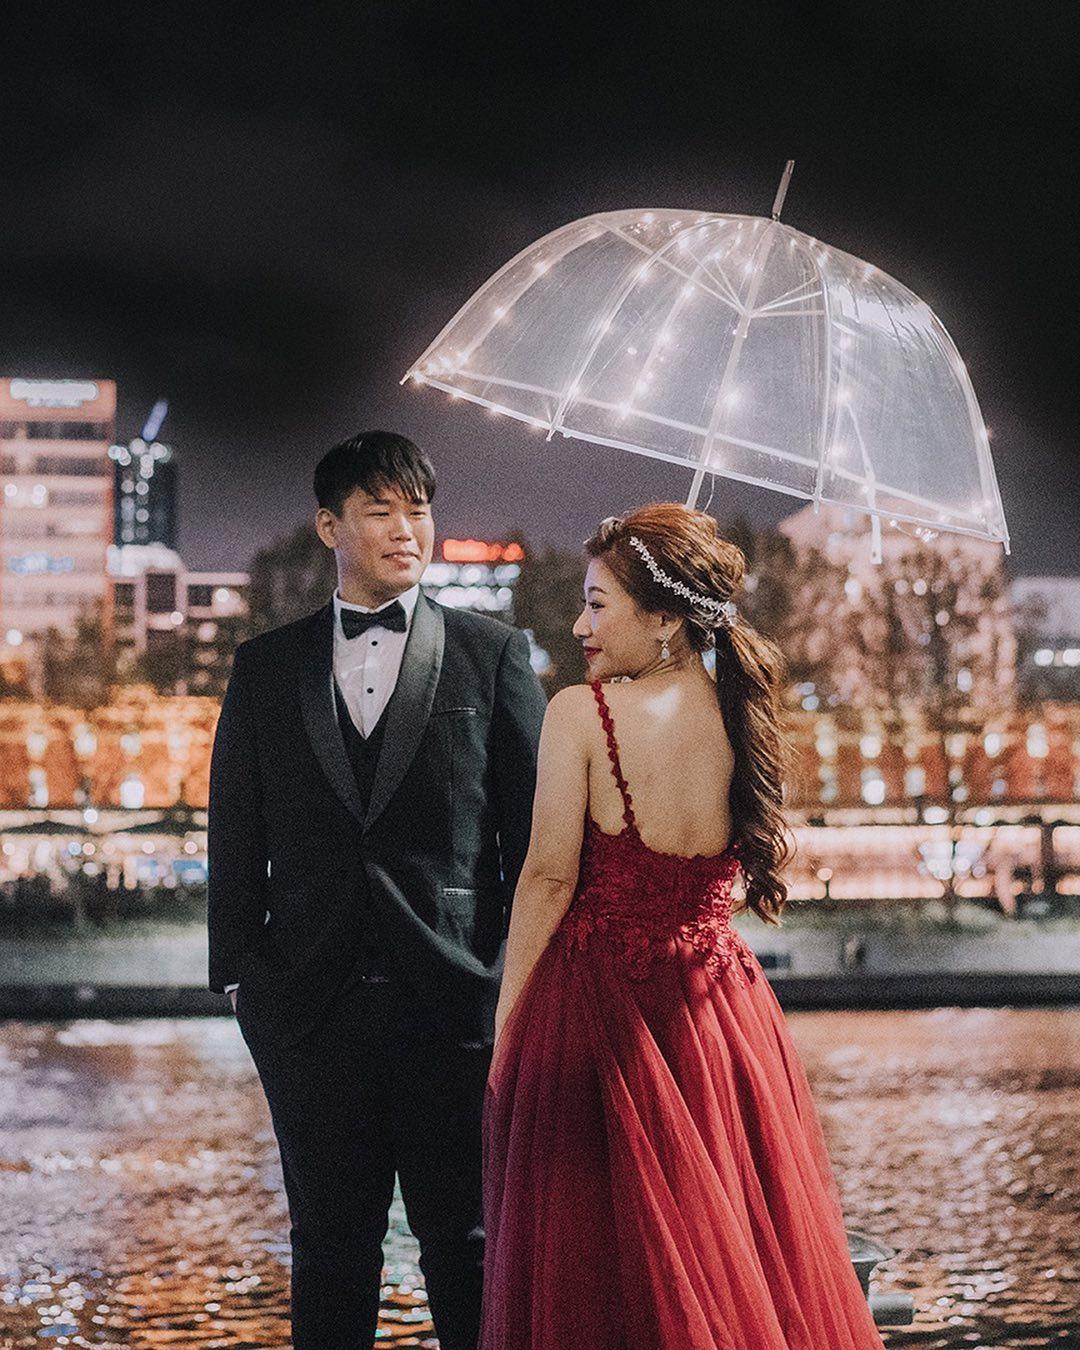 Umbrella fairy lights wedding photoshoot